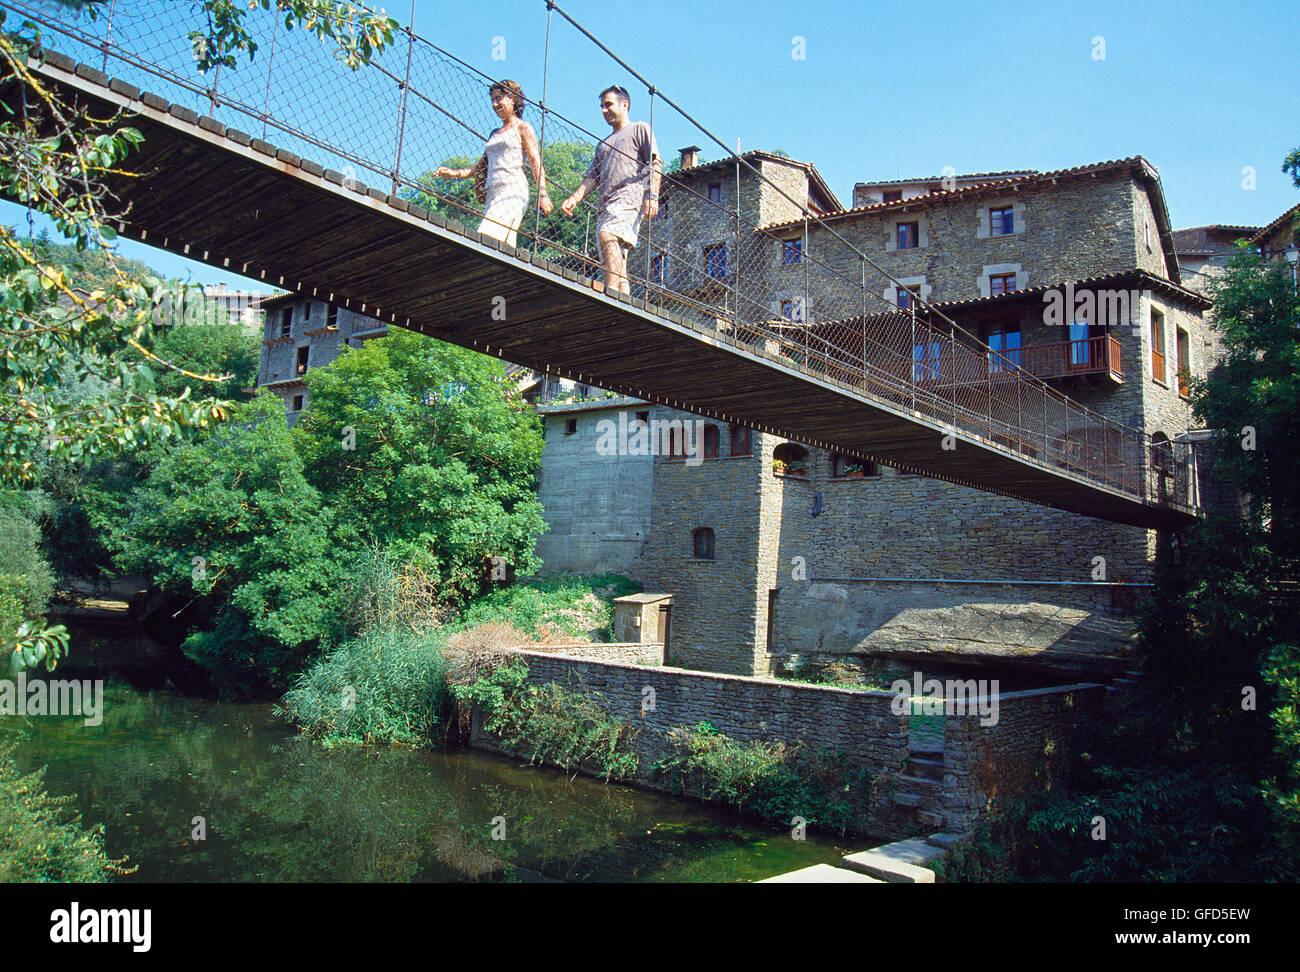 Suspension bridge. Rupit, Barcelona province, Catalonia, Spain. - Stock Image